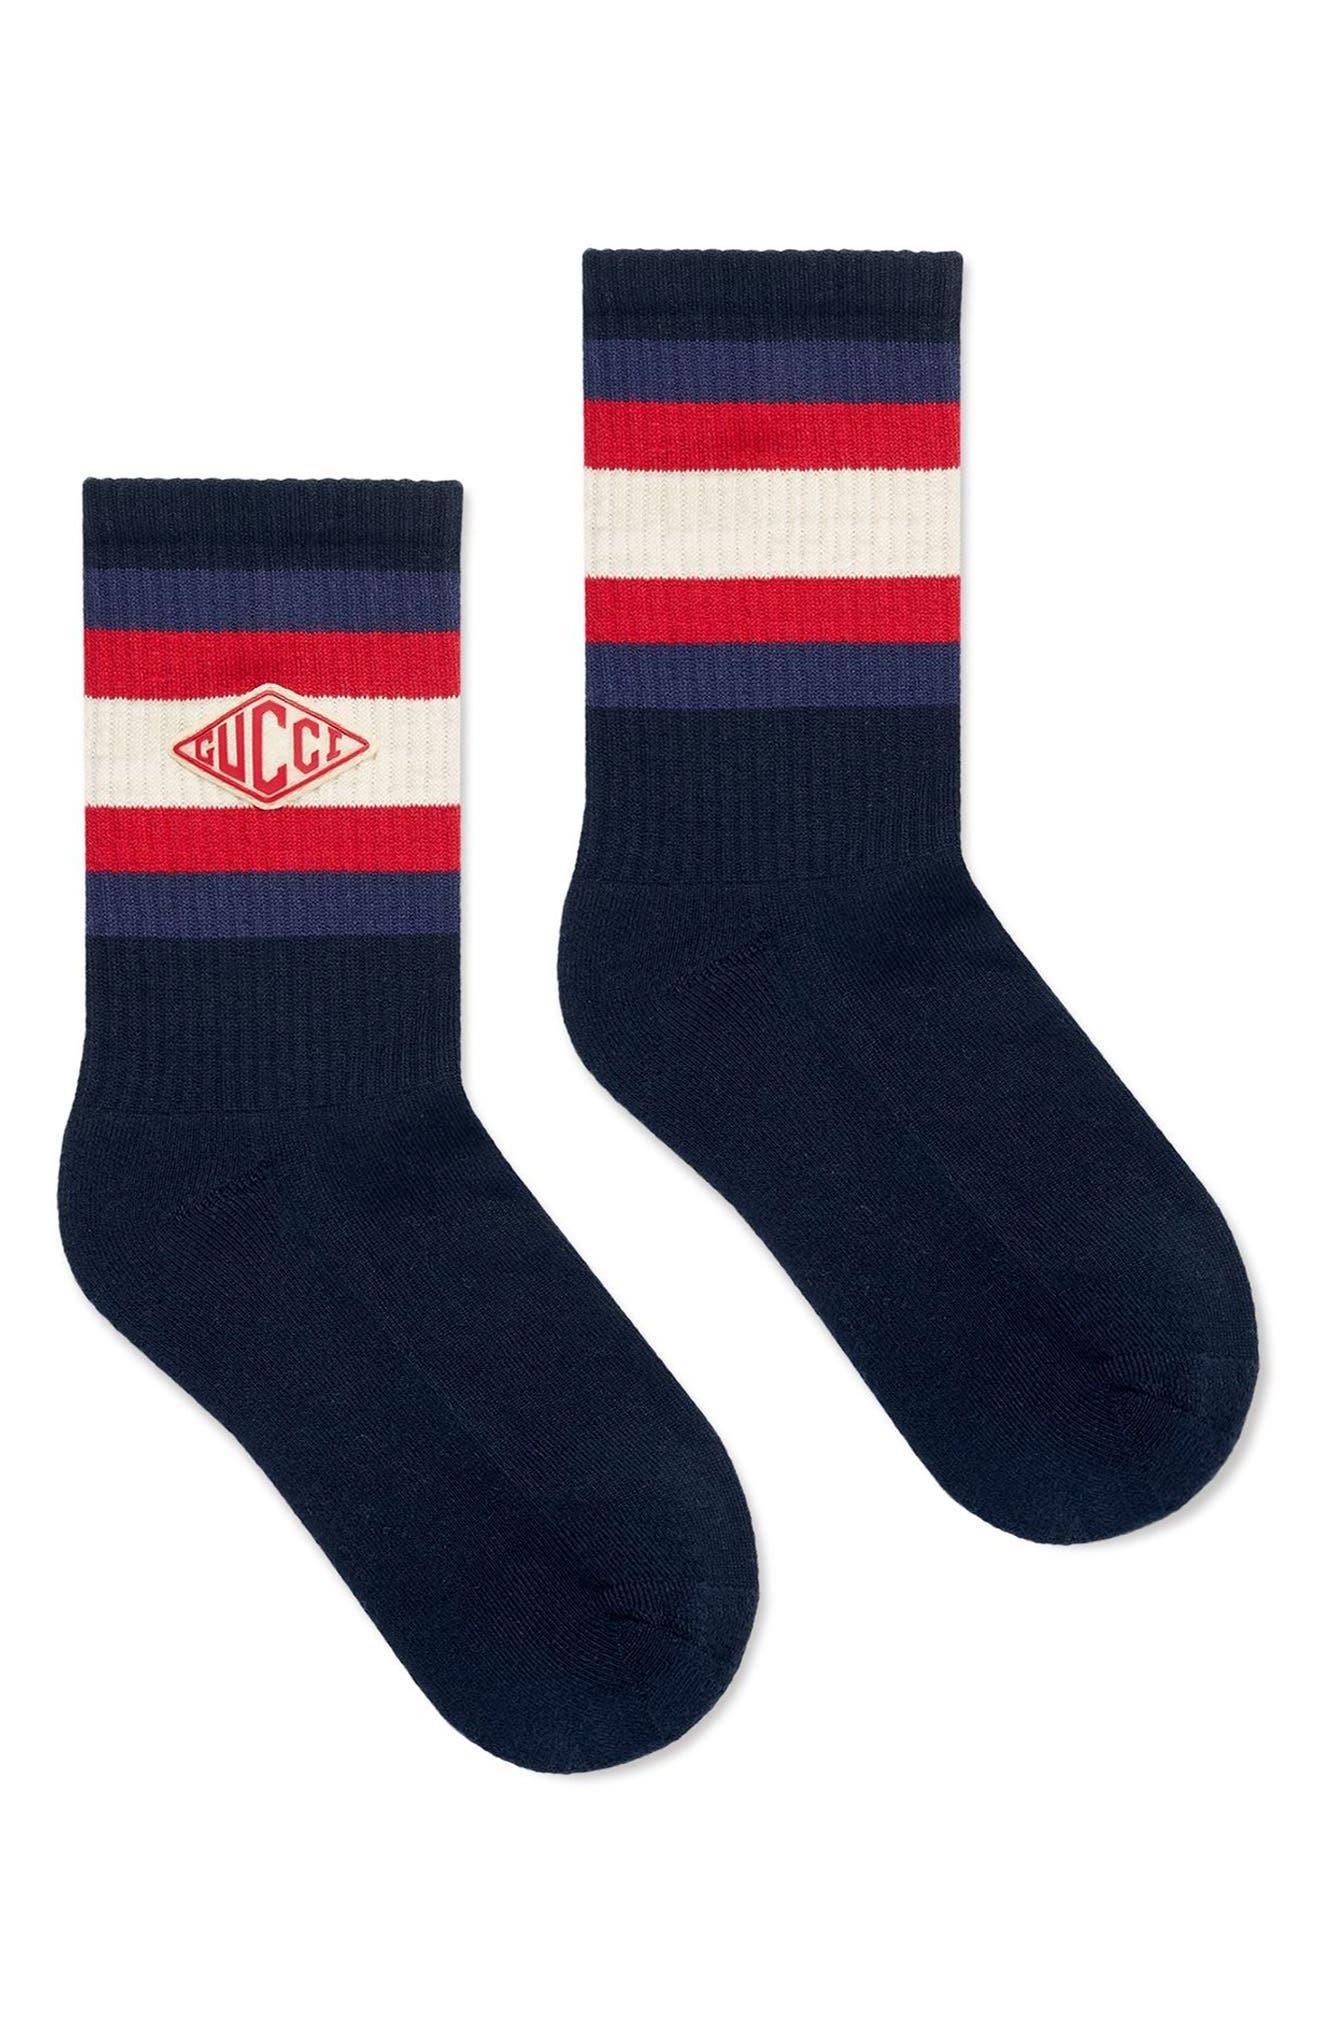 New Logo Socks,                             Alternate thumbnail 2, color,                             Midnight Blue